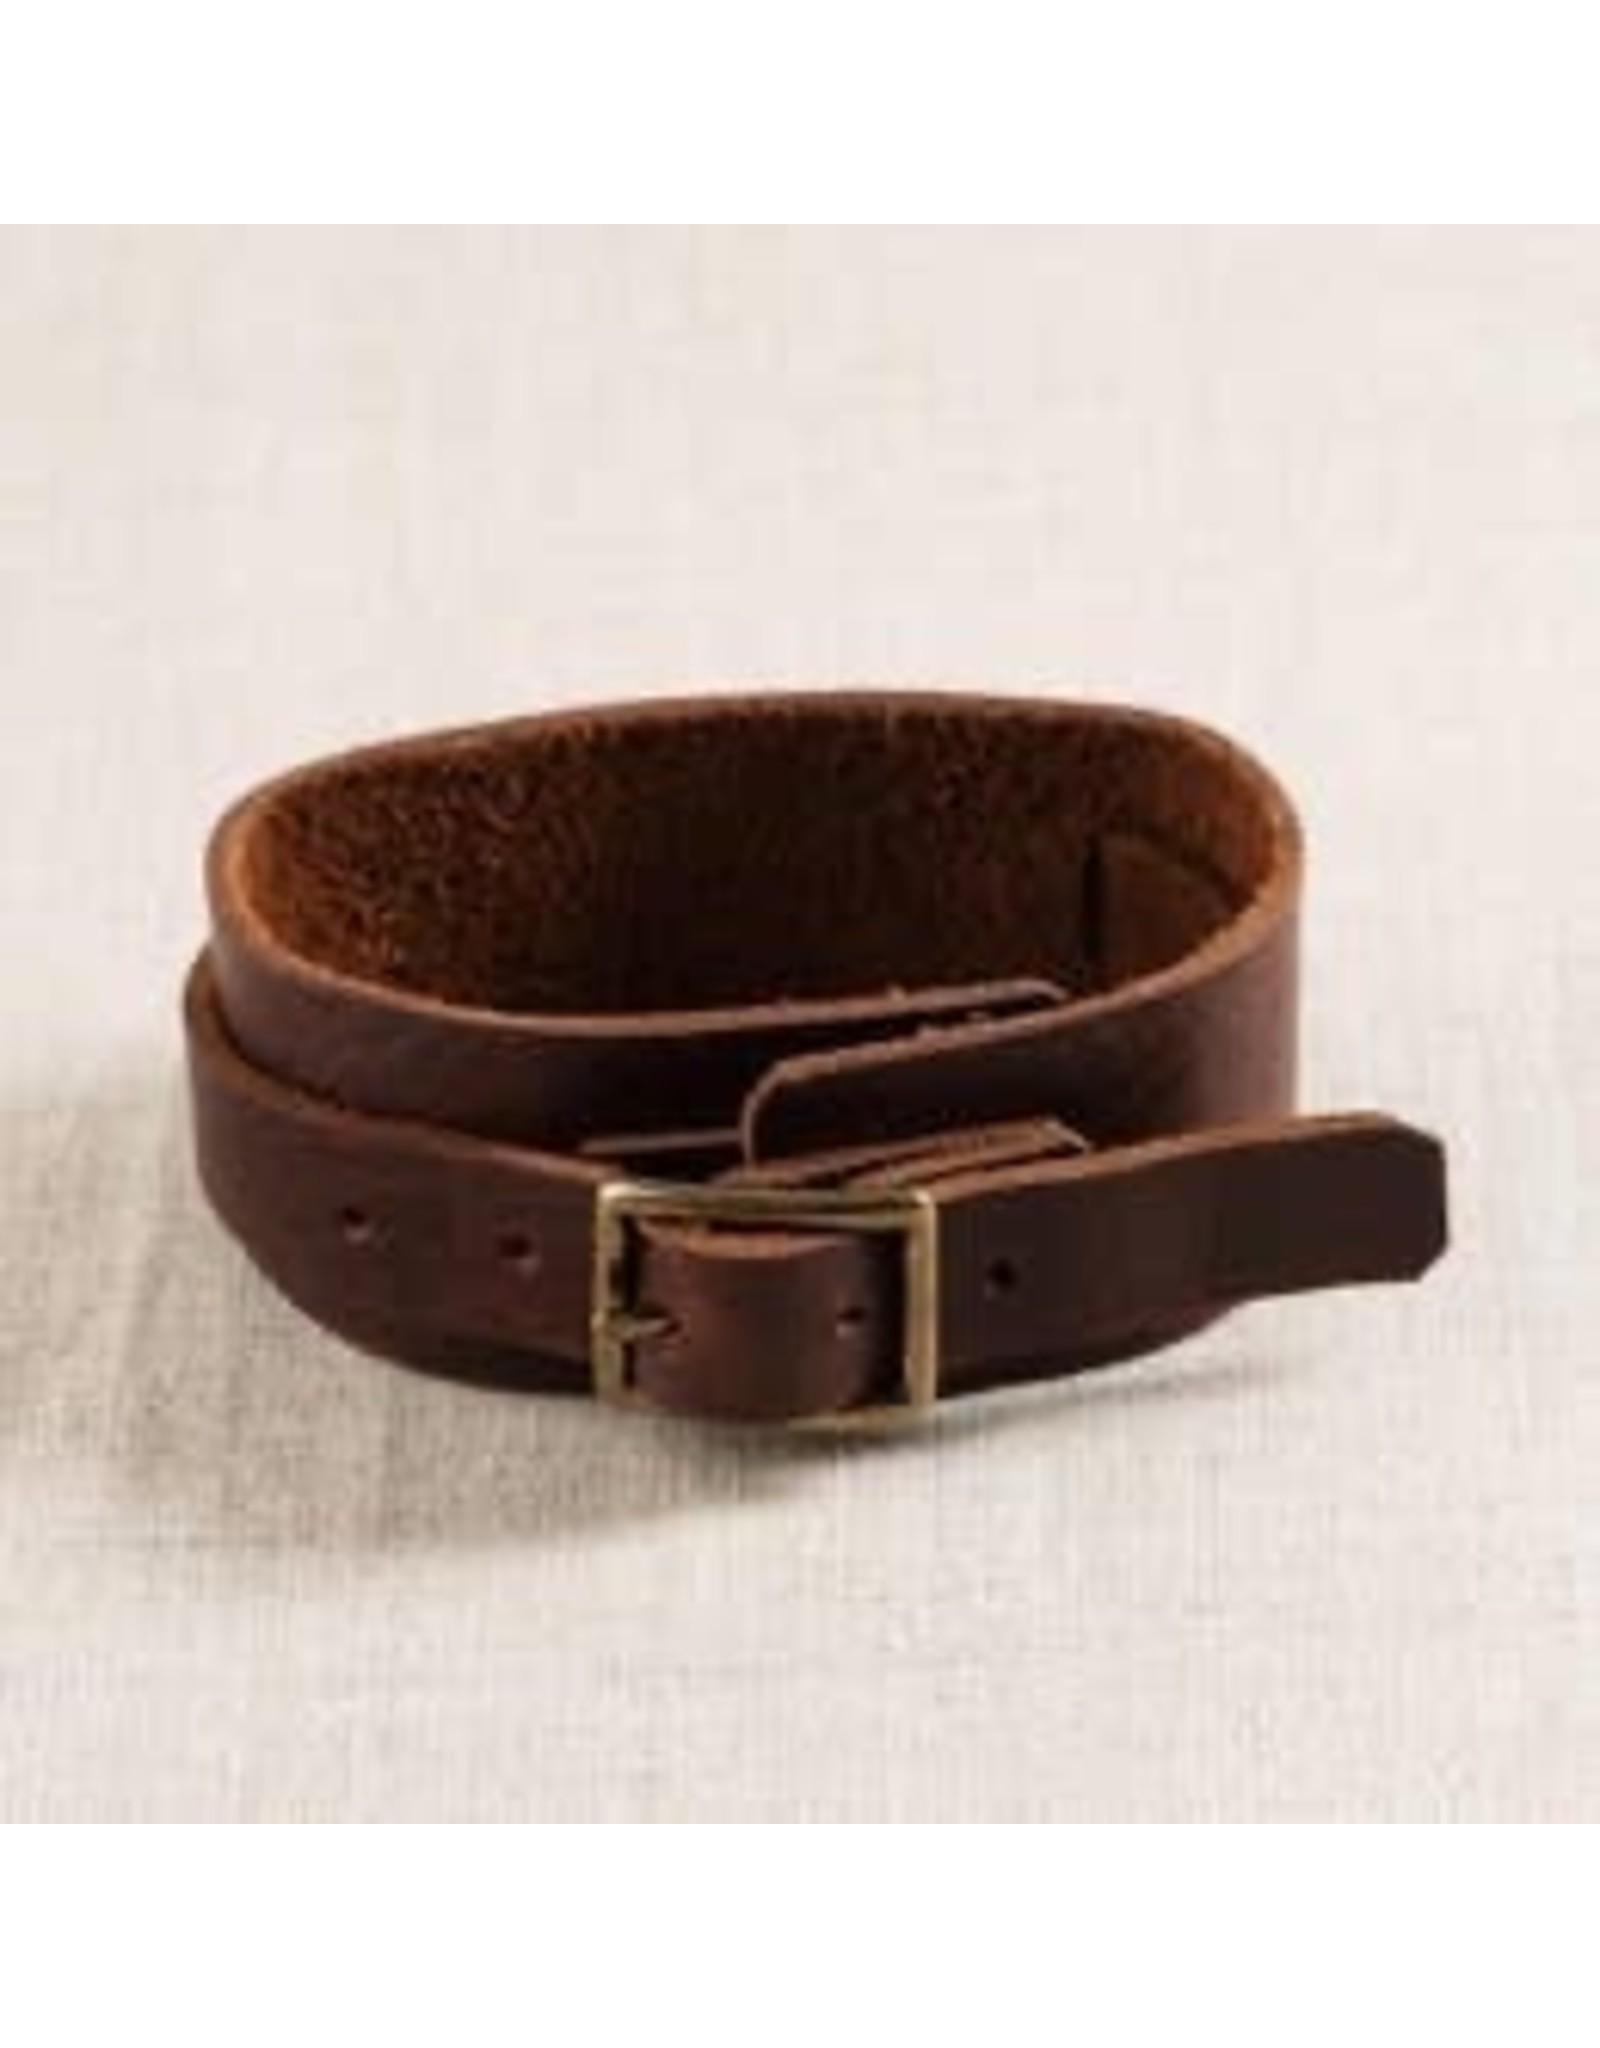 Repurposed On Purpose Leather Cuff